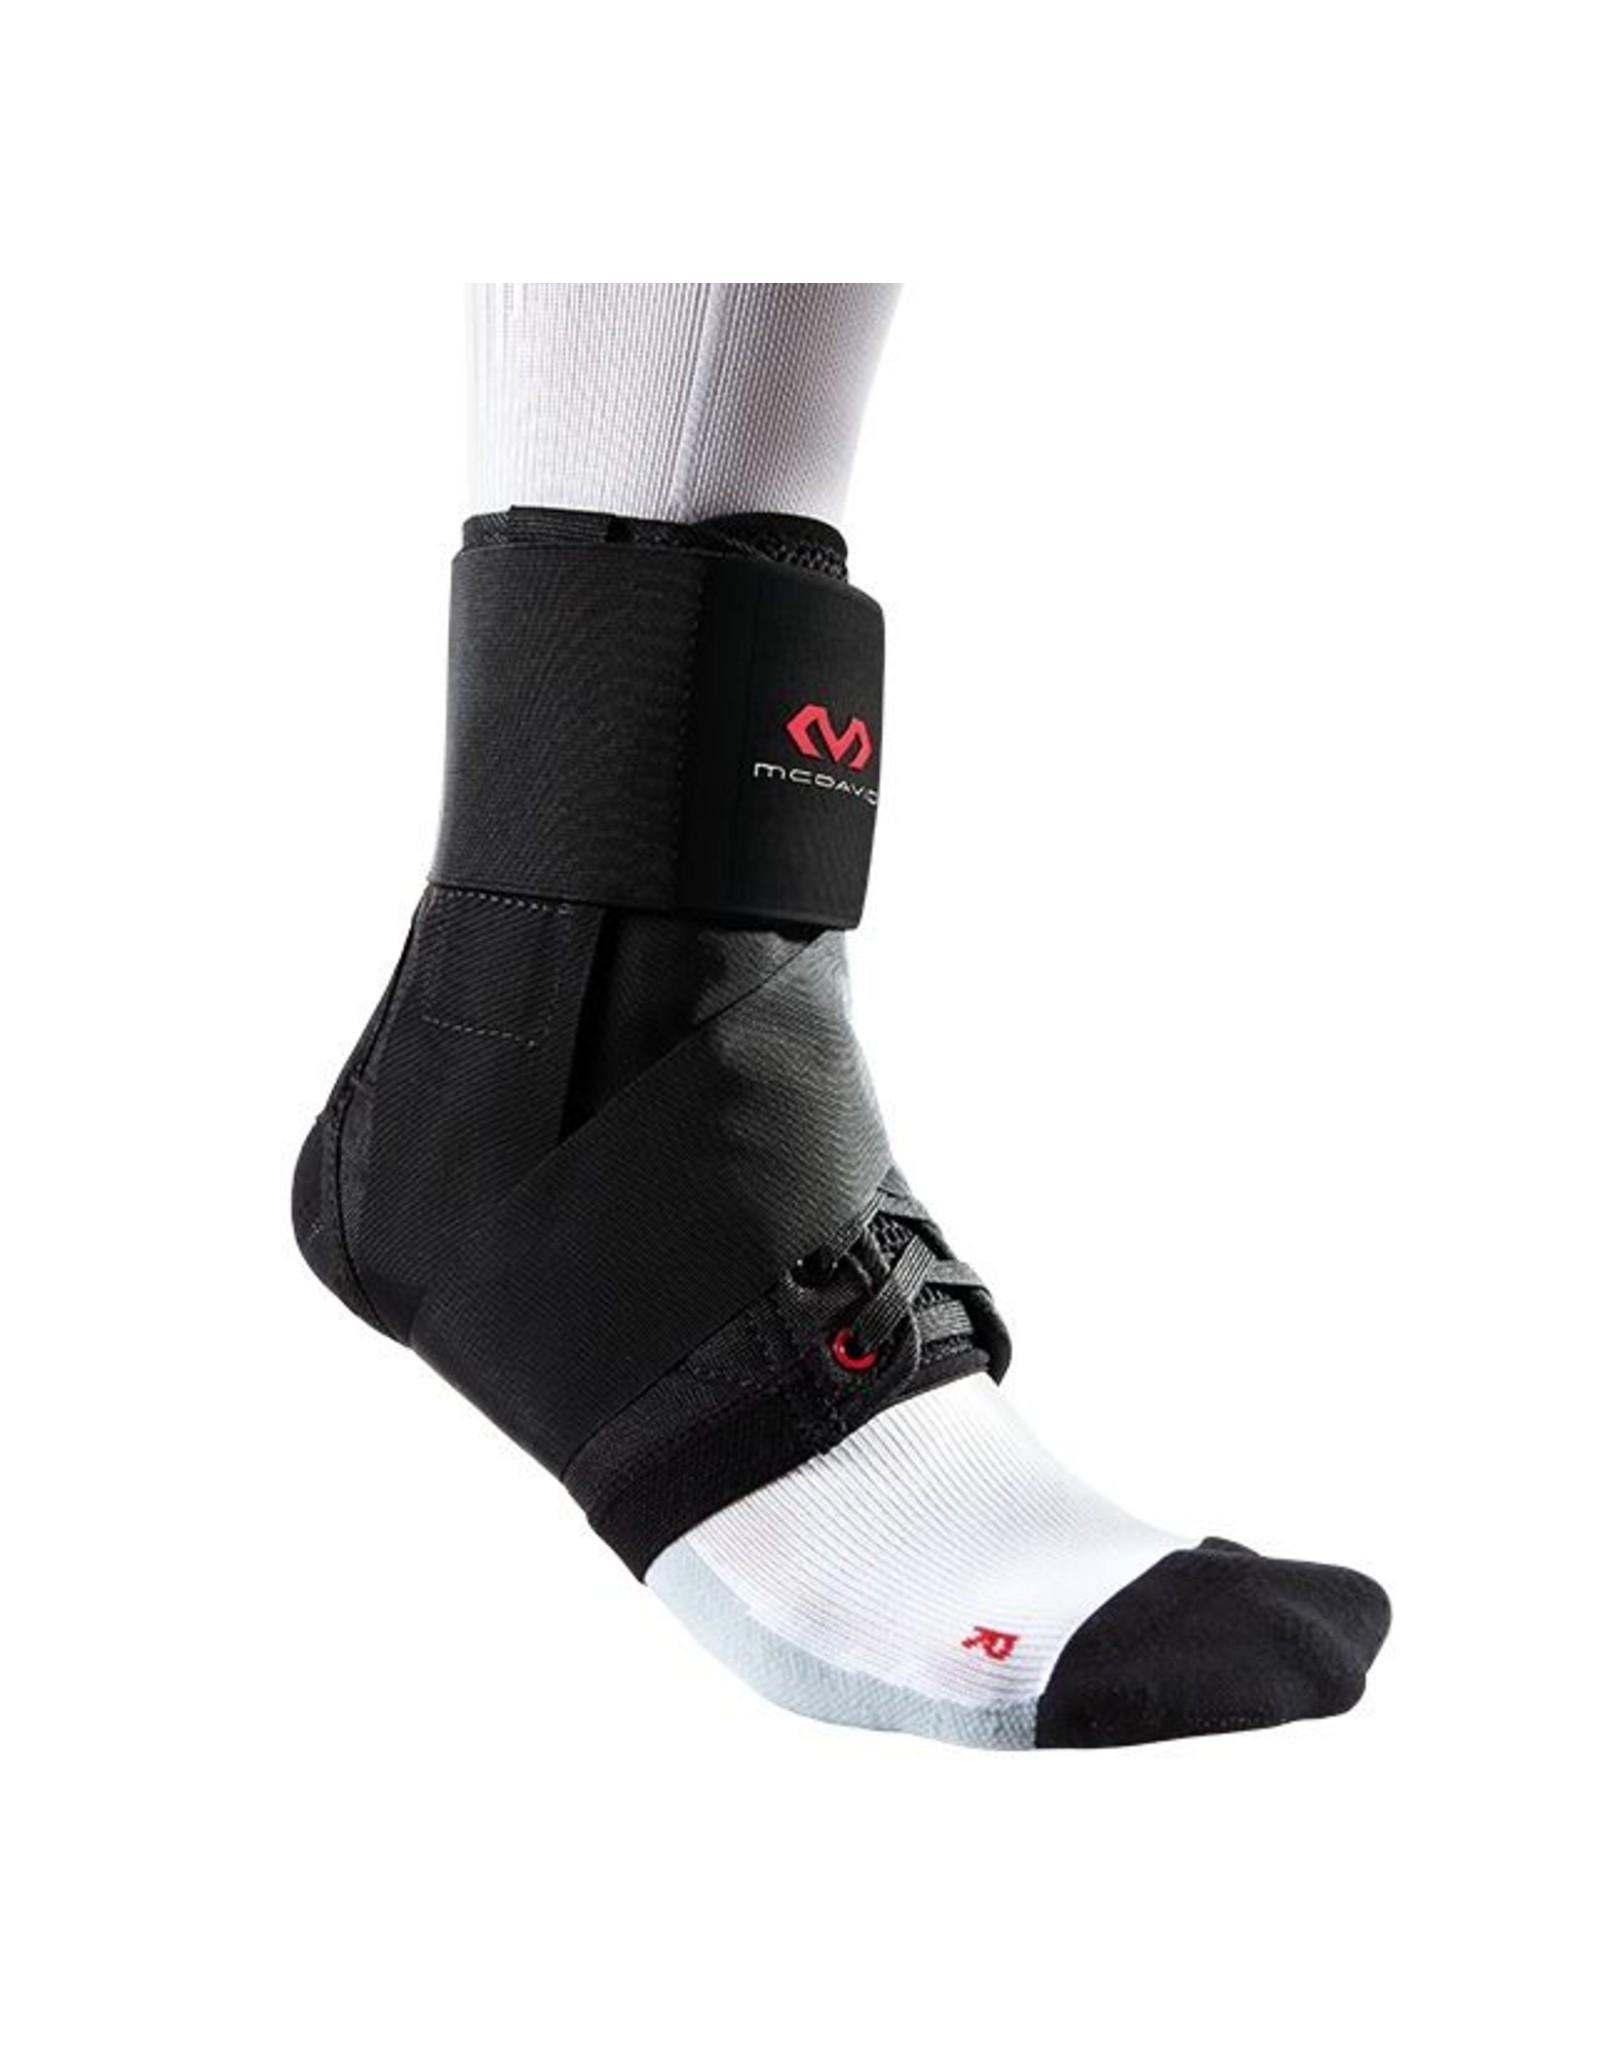 McDavid McDavid Ankle Brace w/ Straps